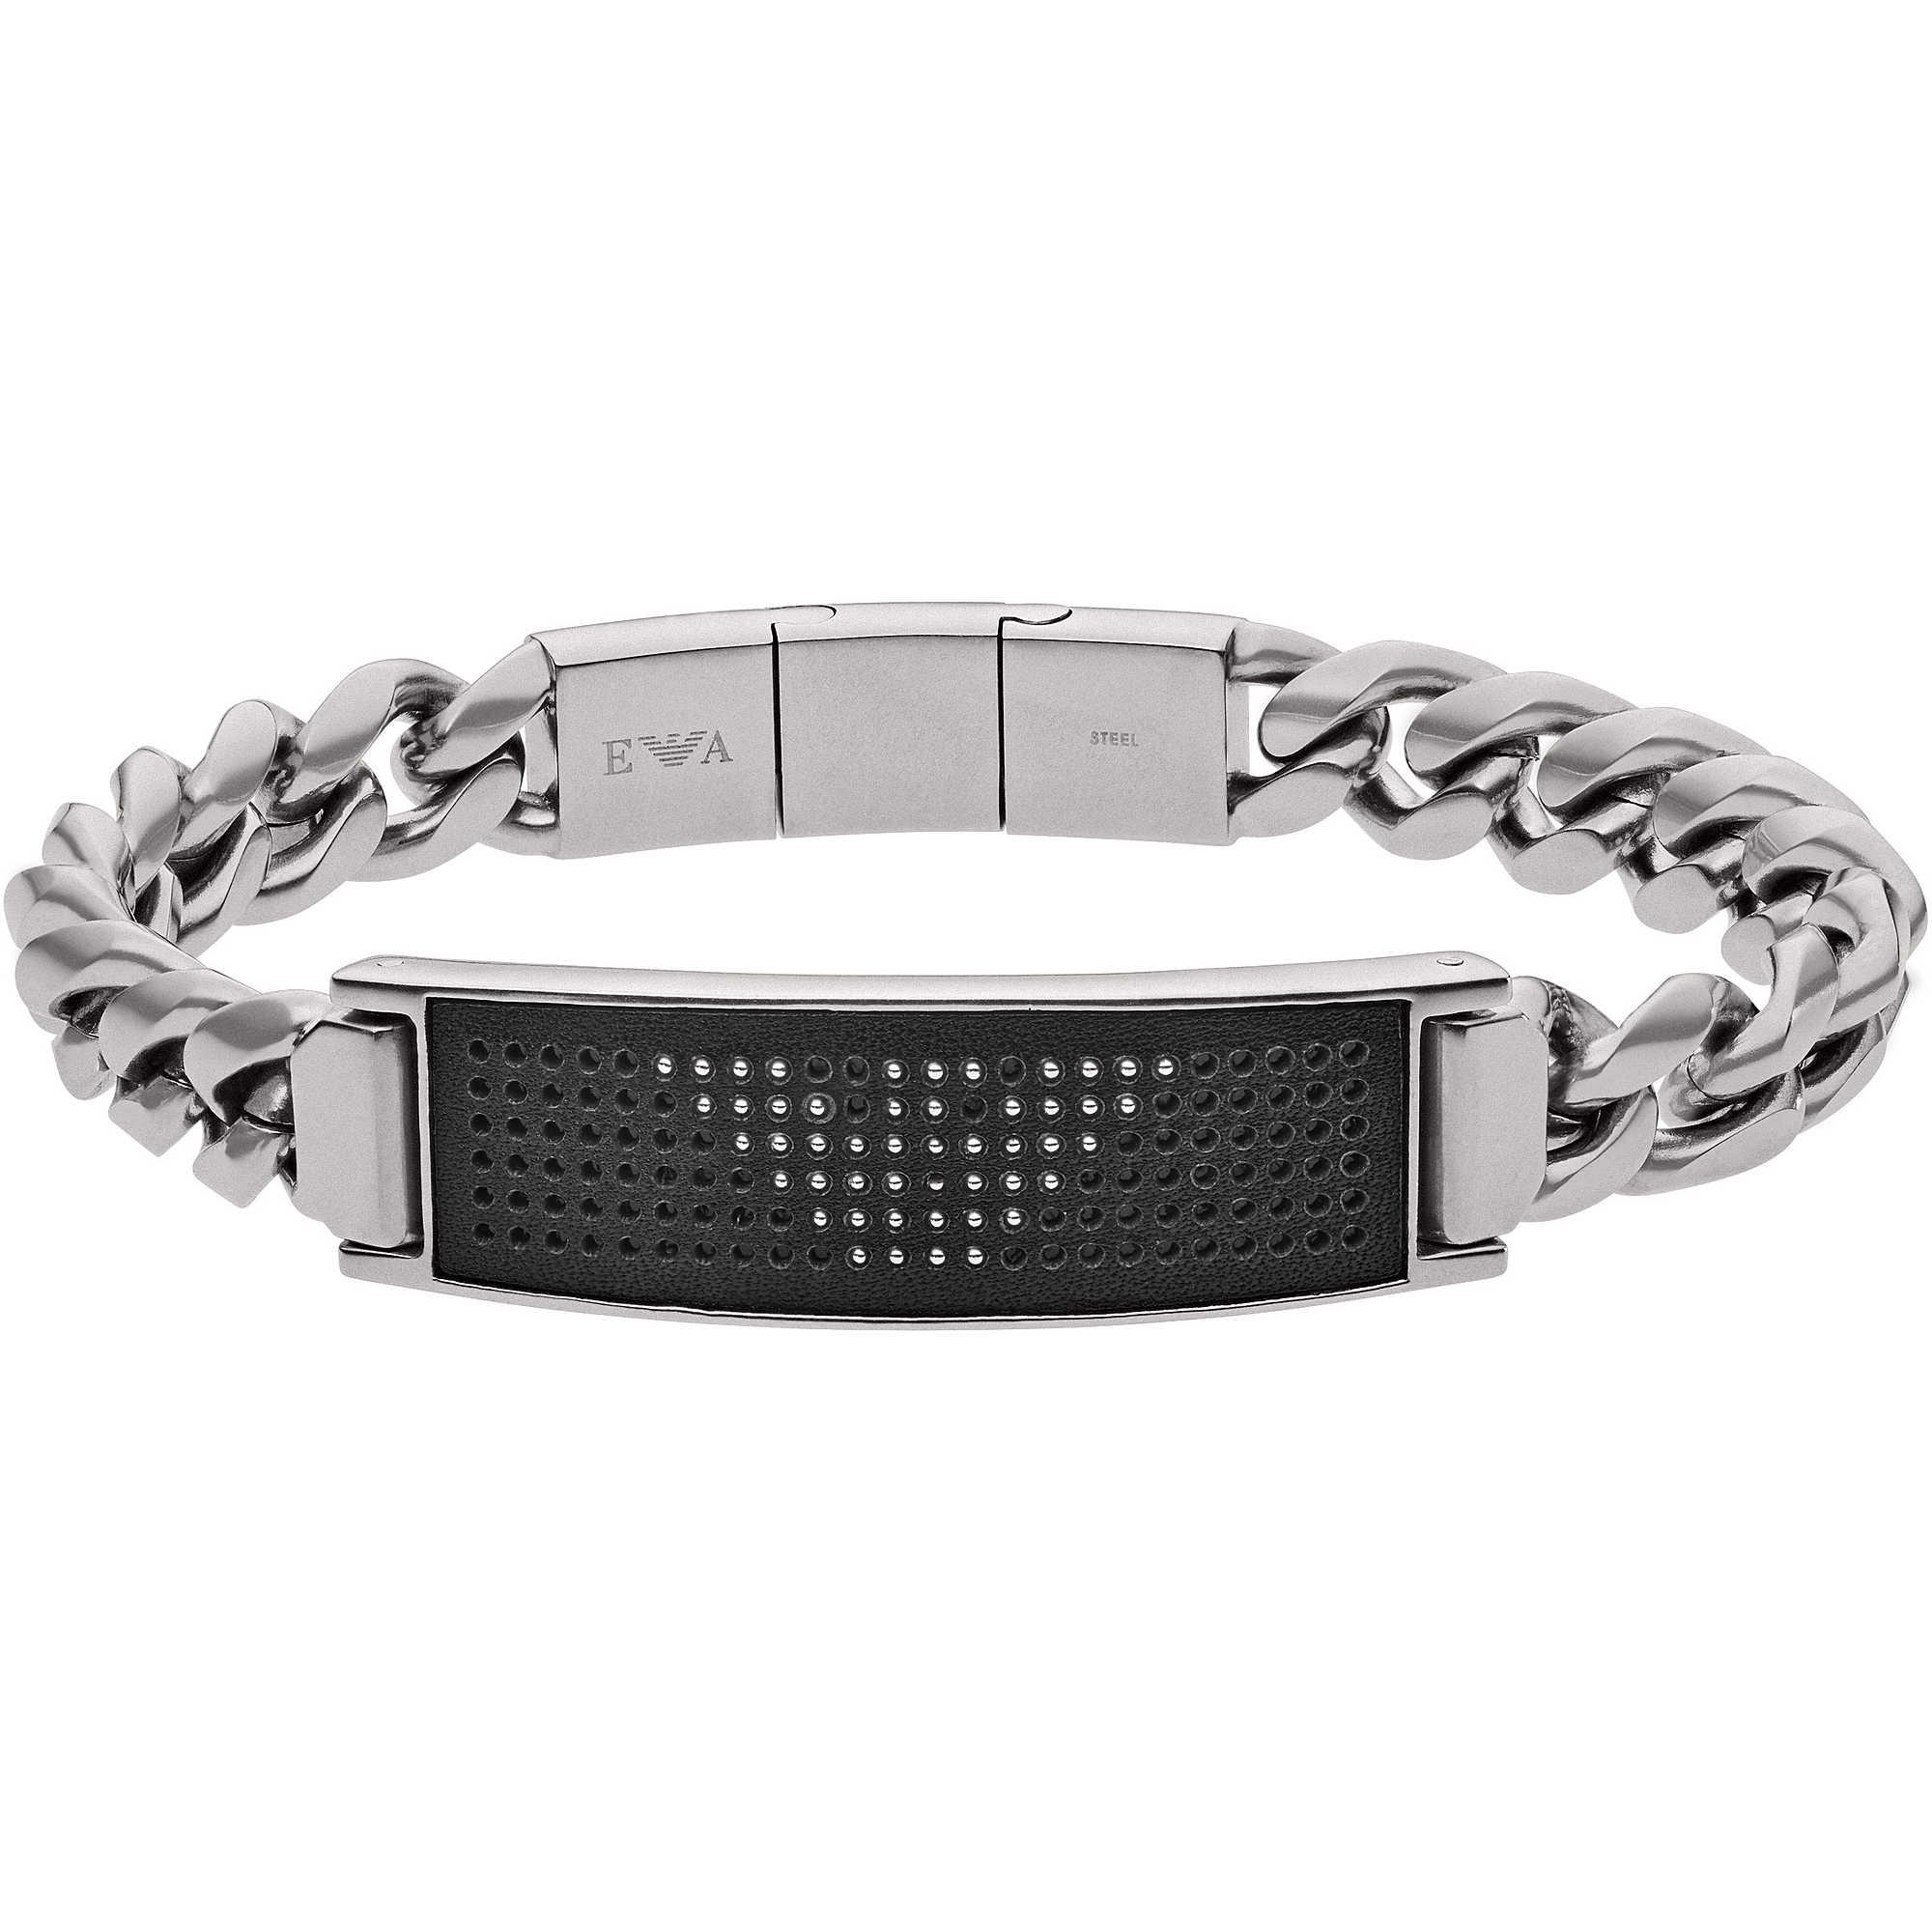 bracelet man jewellery Emporio Armani EGS2548040 bracelets Emporio ... 6f17ebbc833